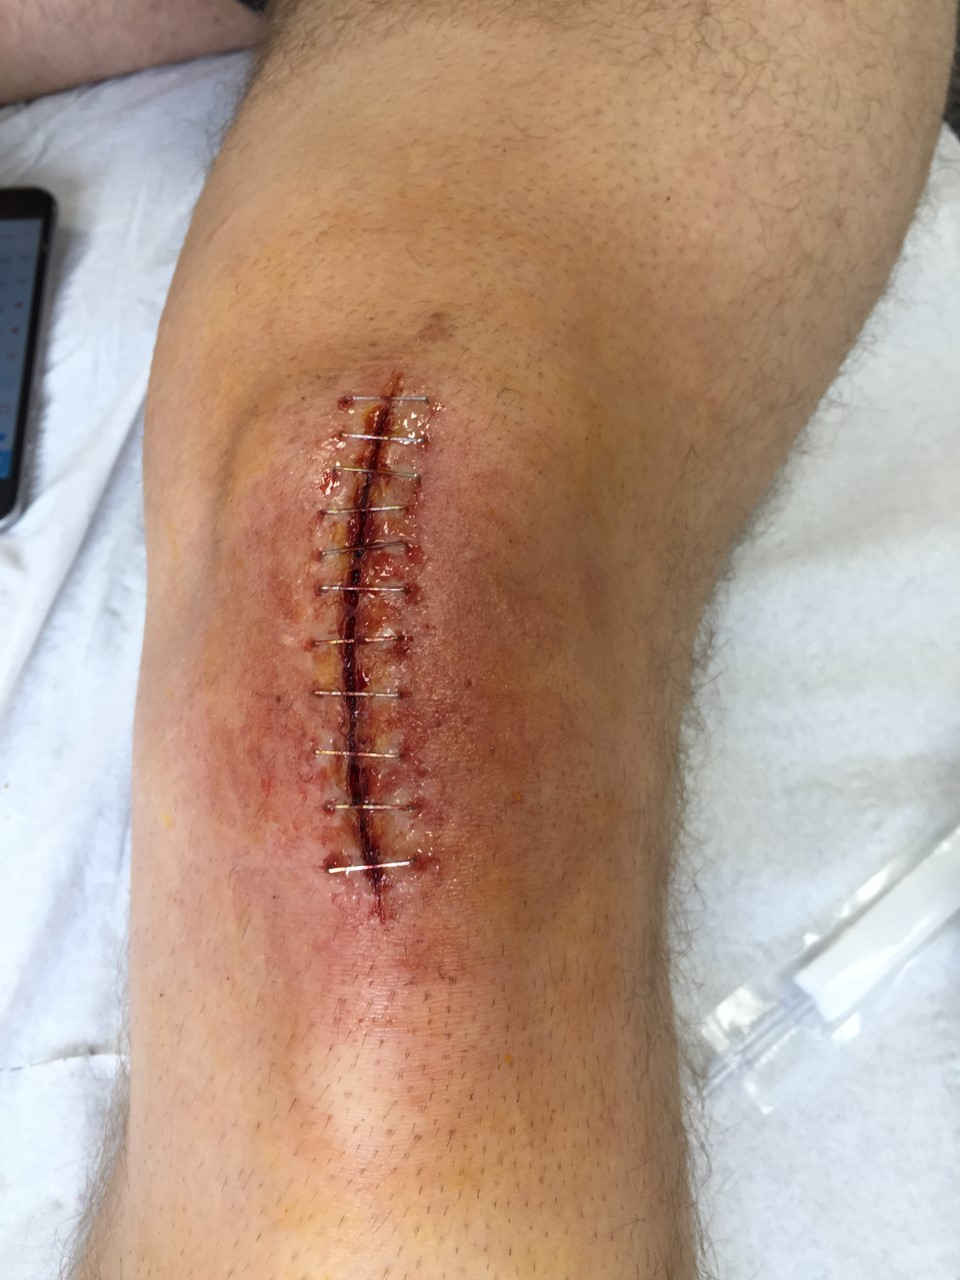 spfx knee surgery makeup